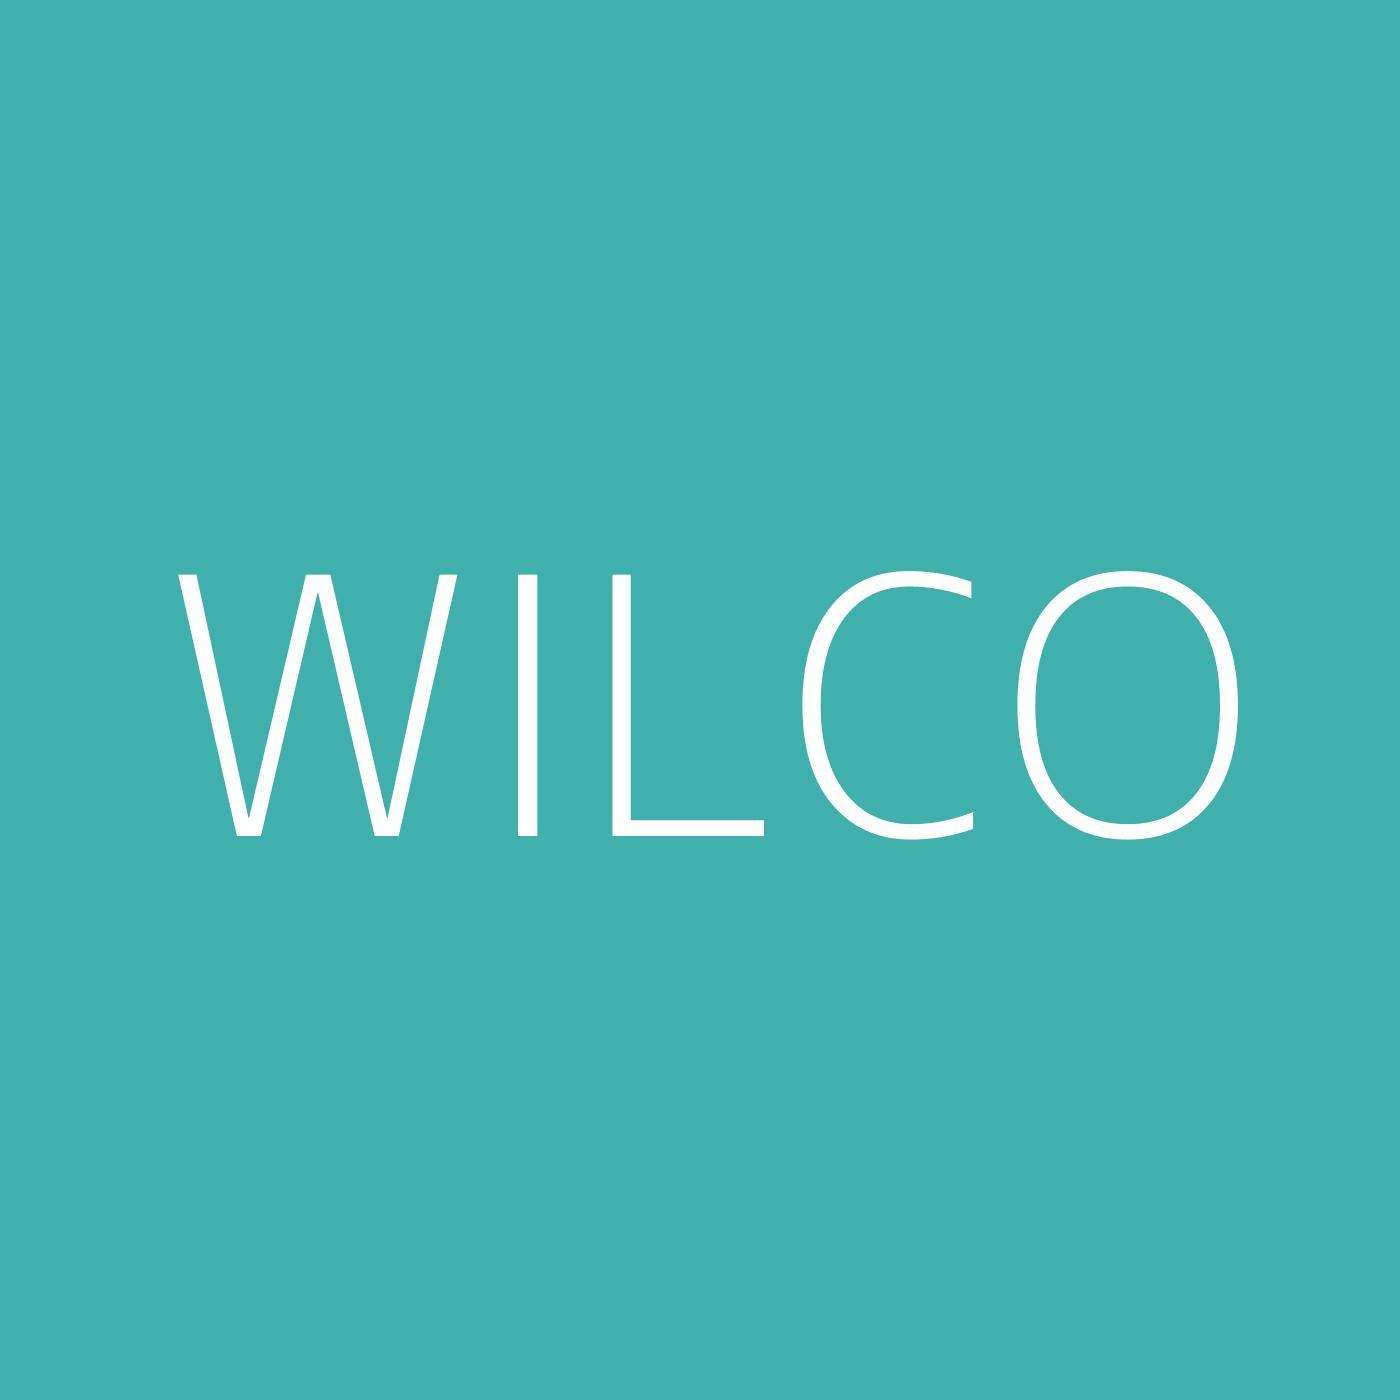 Wilco Playlist Artwork